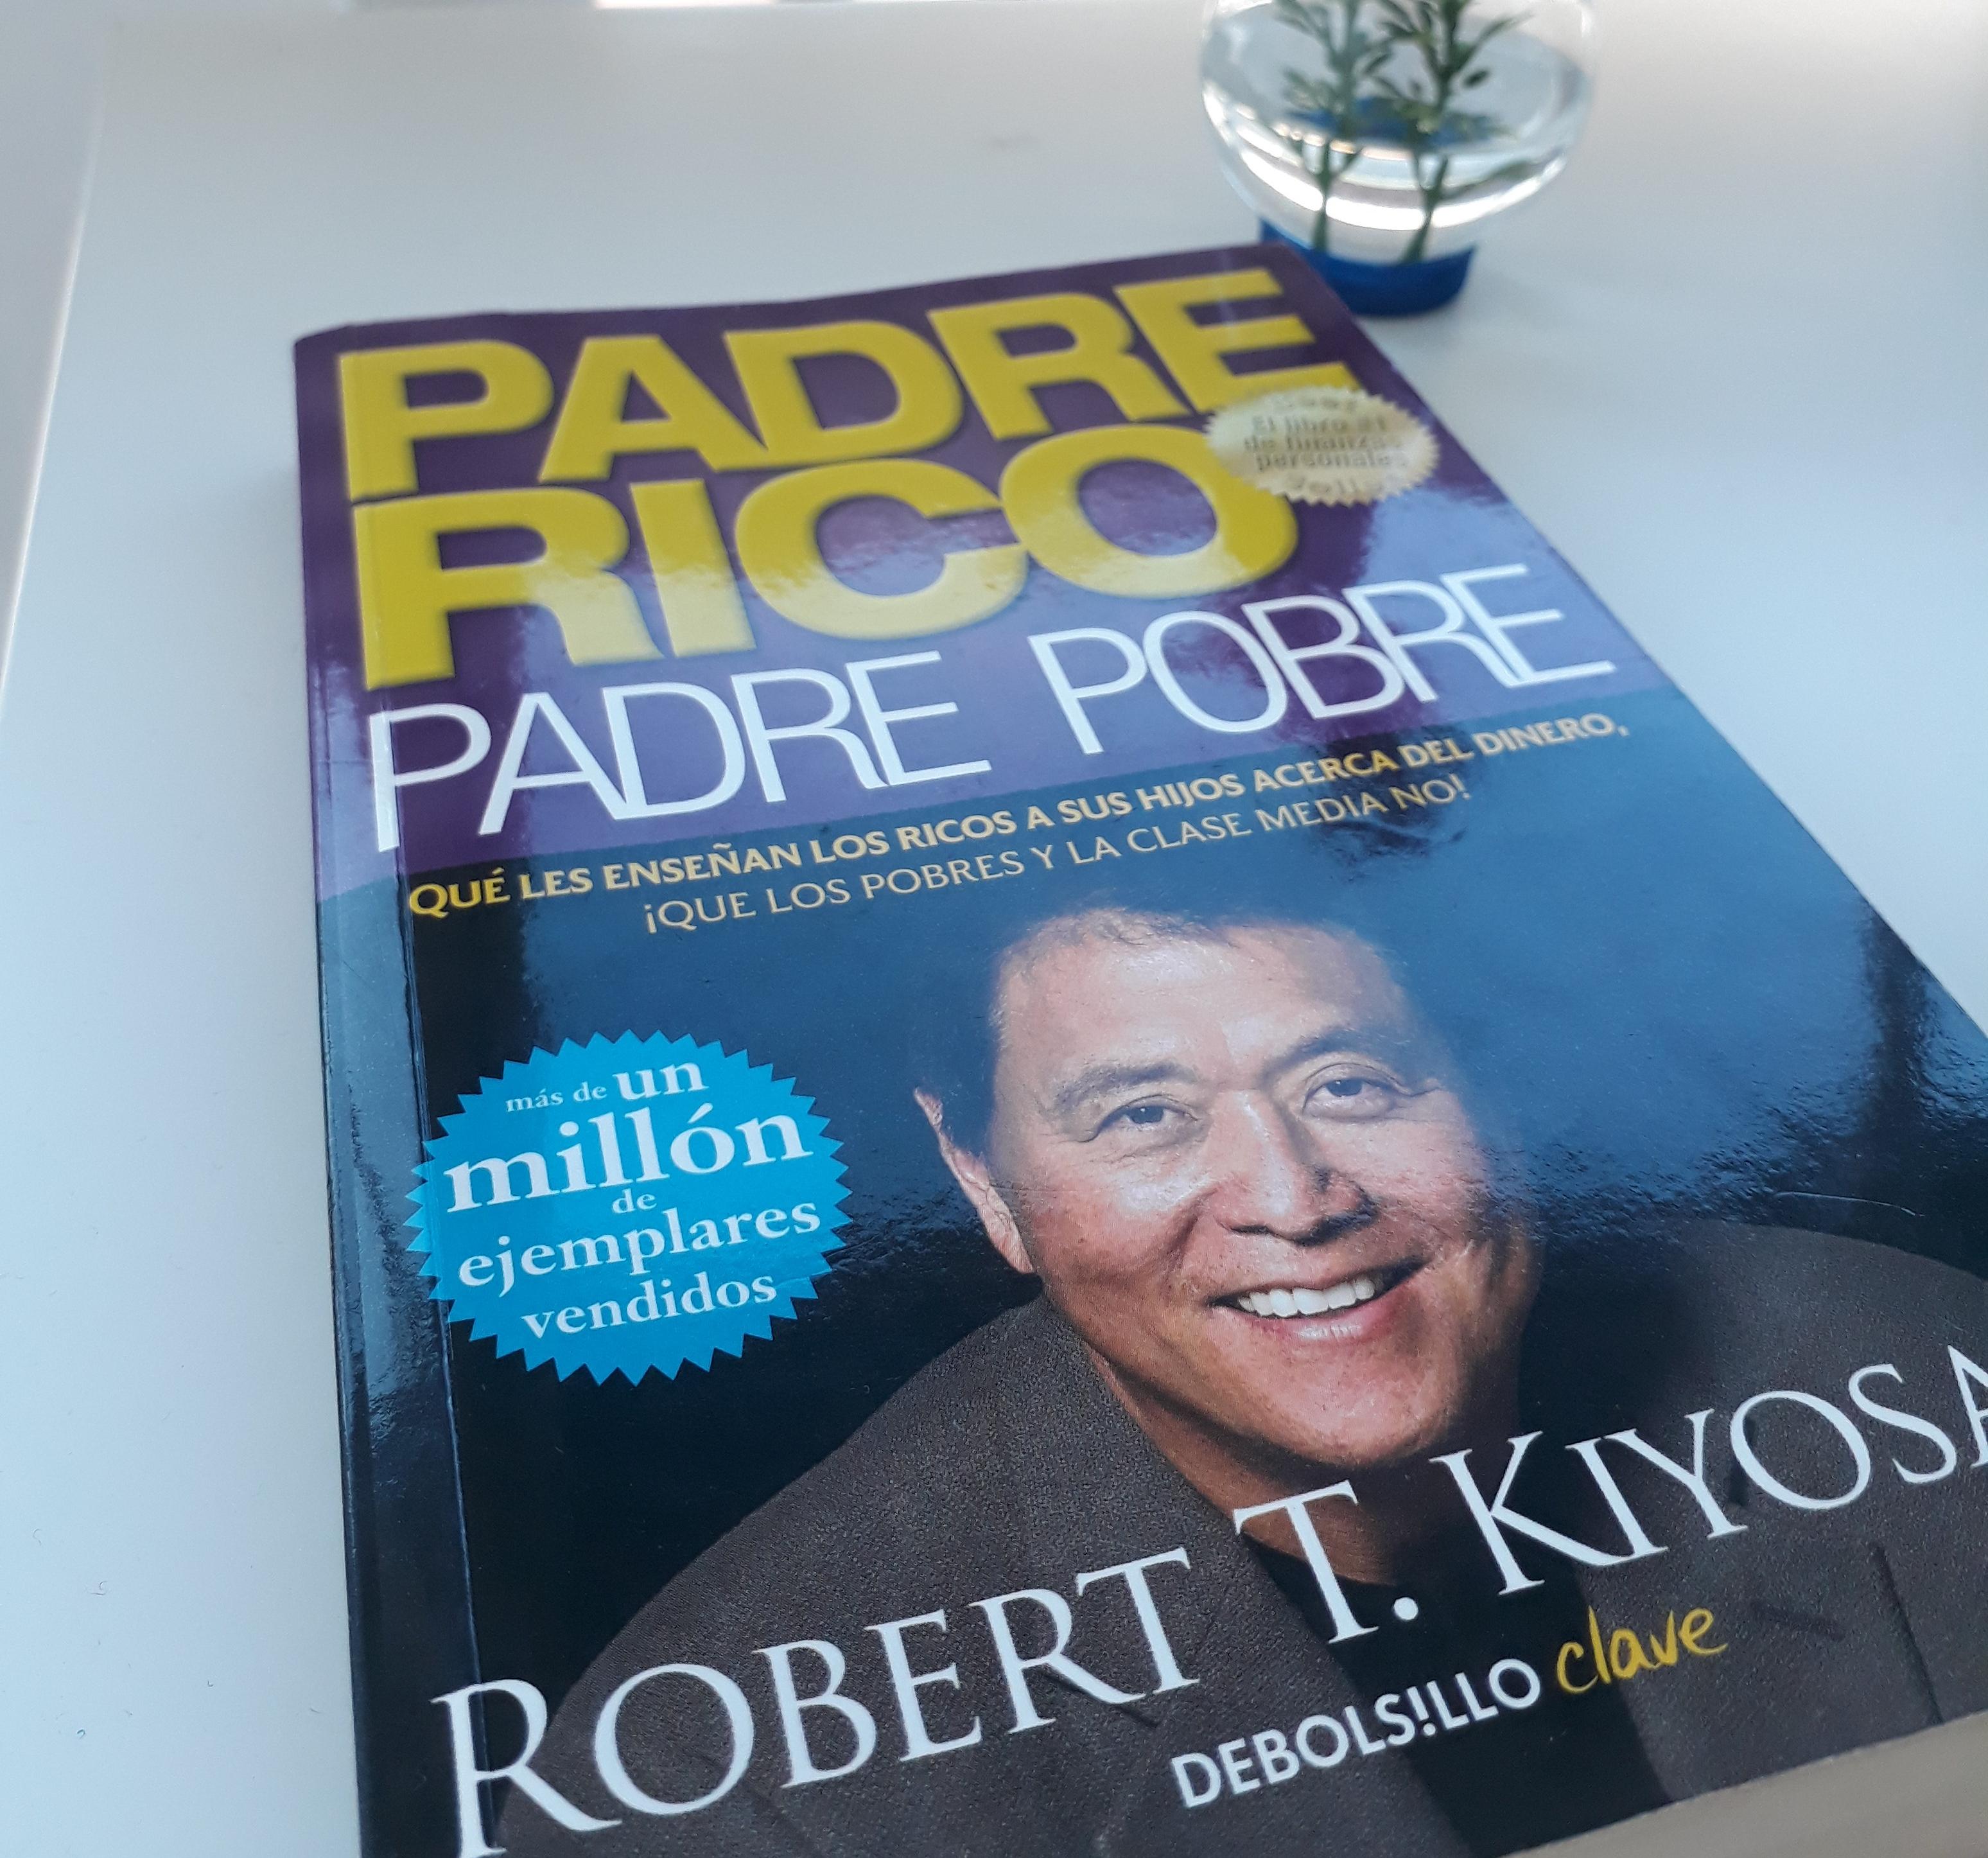 Padre Rico,Padre Pobre de Robert Kiyosaki ...